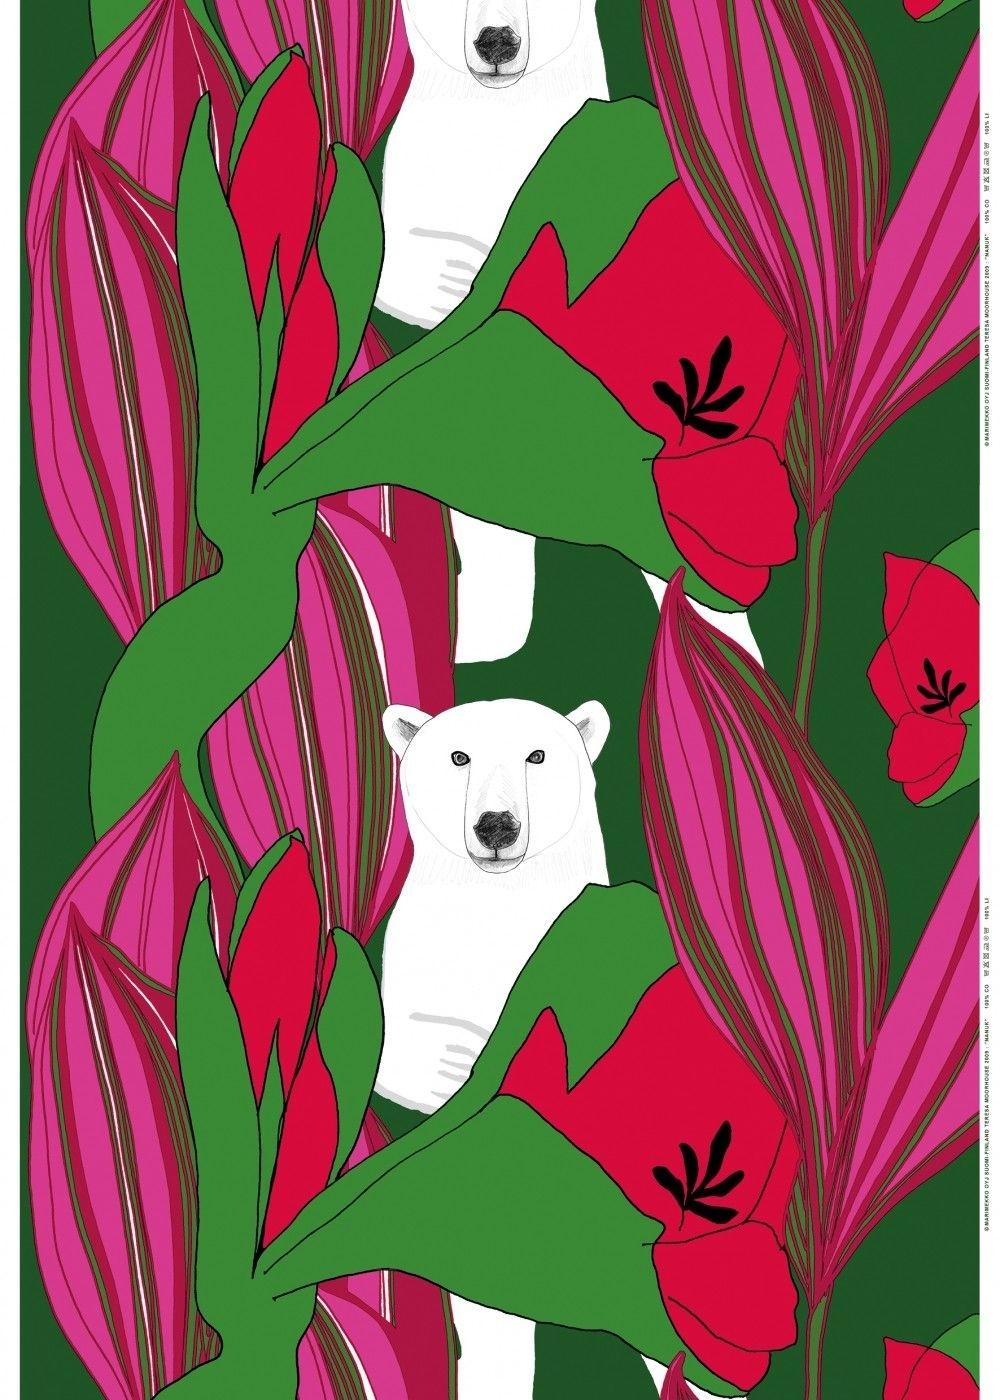 Nanuk Fabric | Cotton Fabrics | Marimekko | Pattern | Pinterest With Regard To Most Current Marimekko 'kevatjuhla' Fabric Wall Art (View 9 of 15)